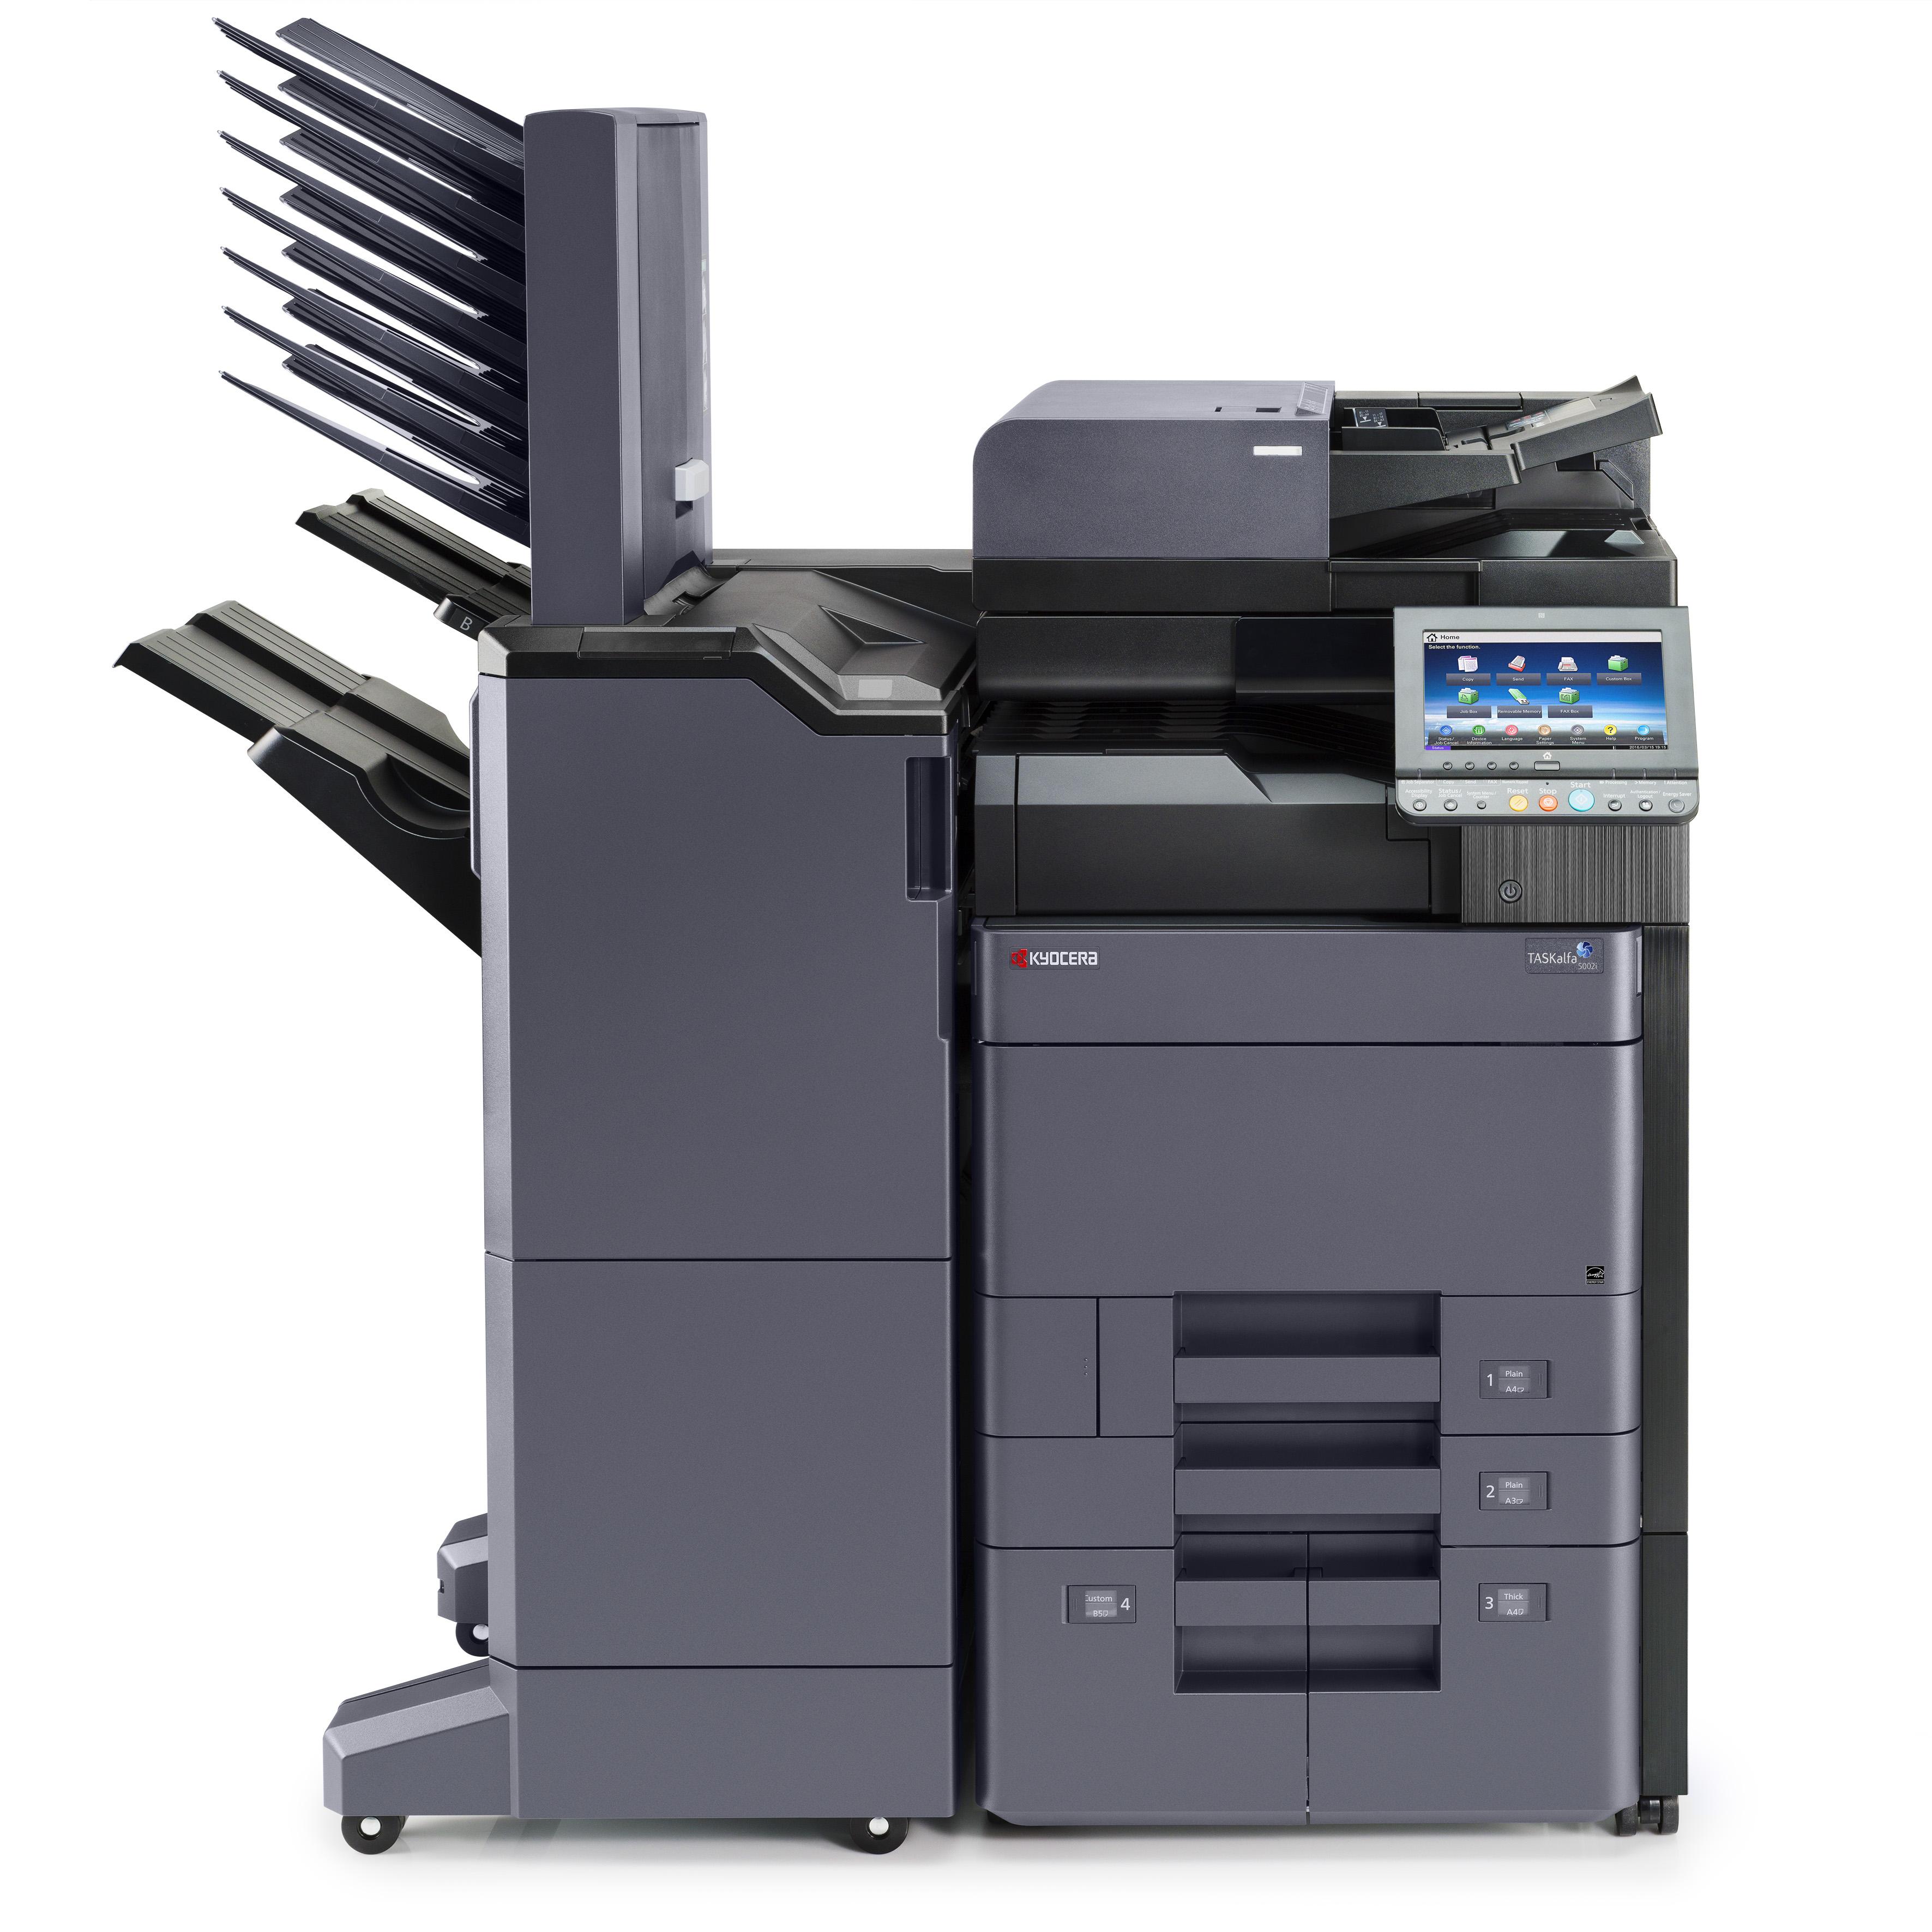 No one supplier of Kyocera MFP printers in Uganda